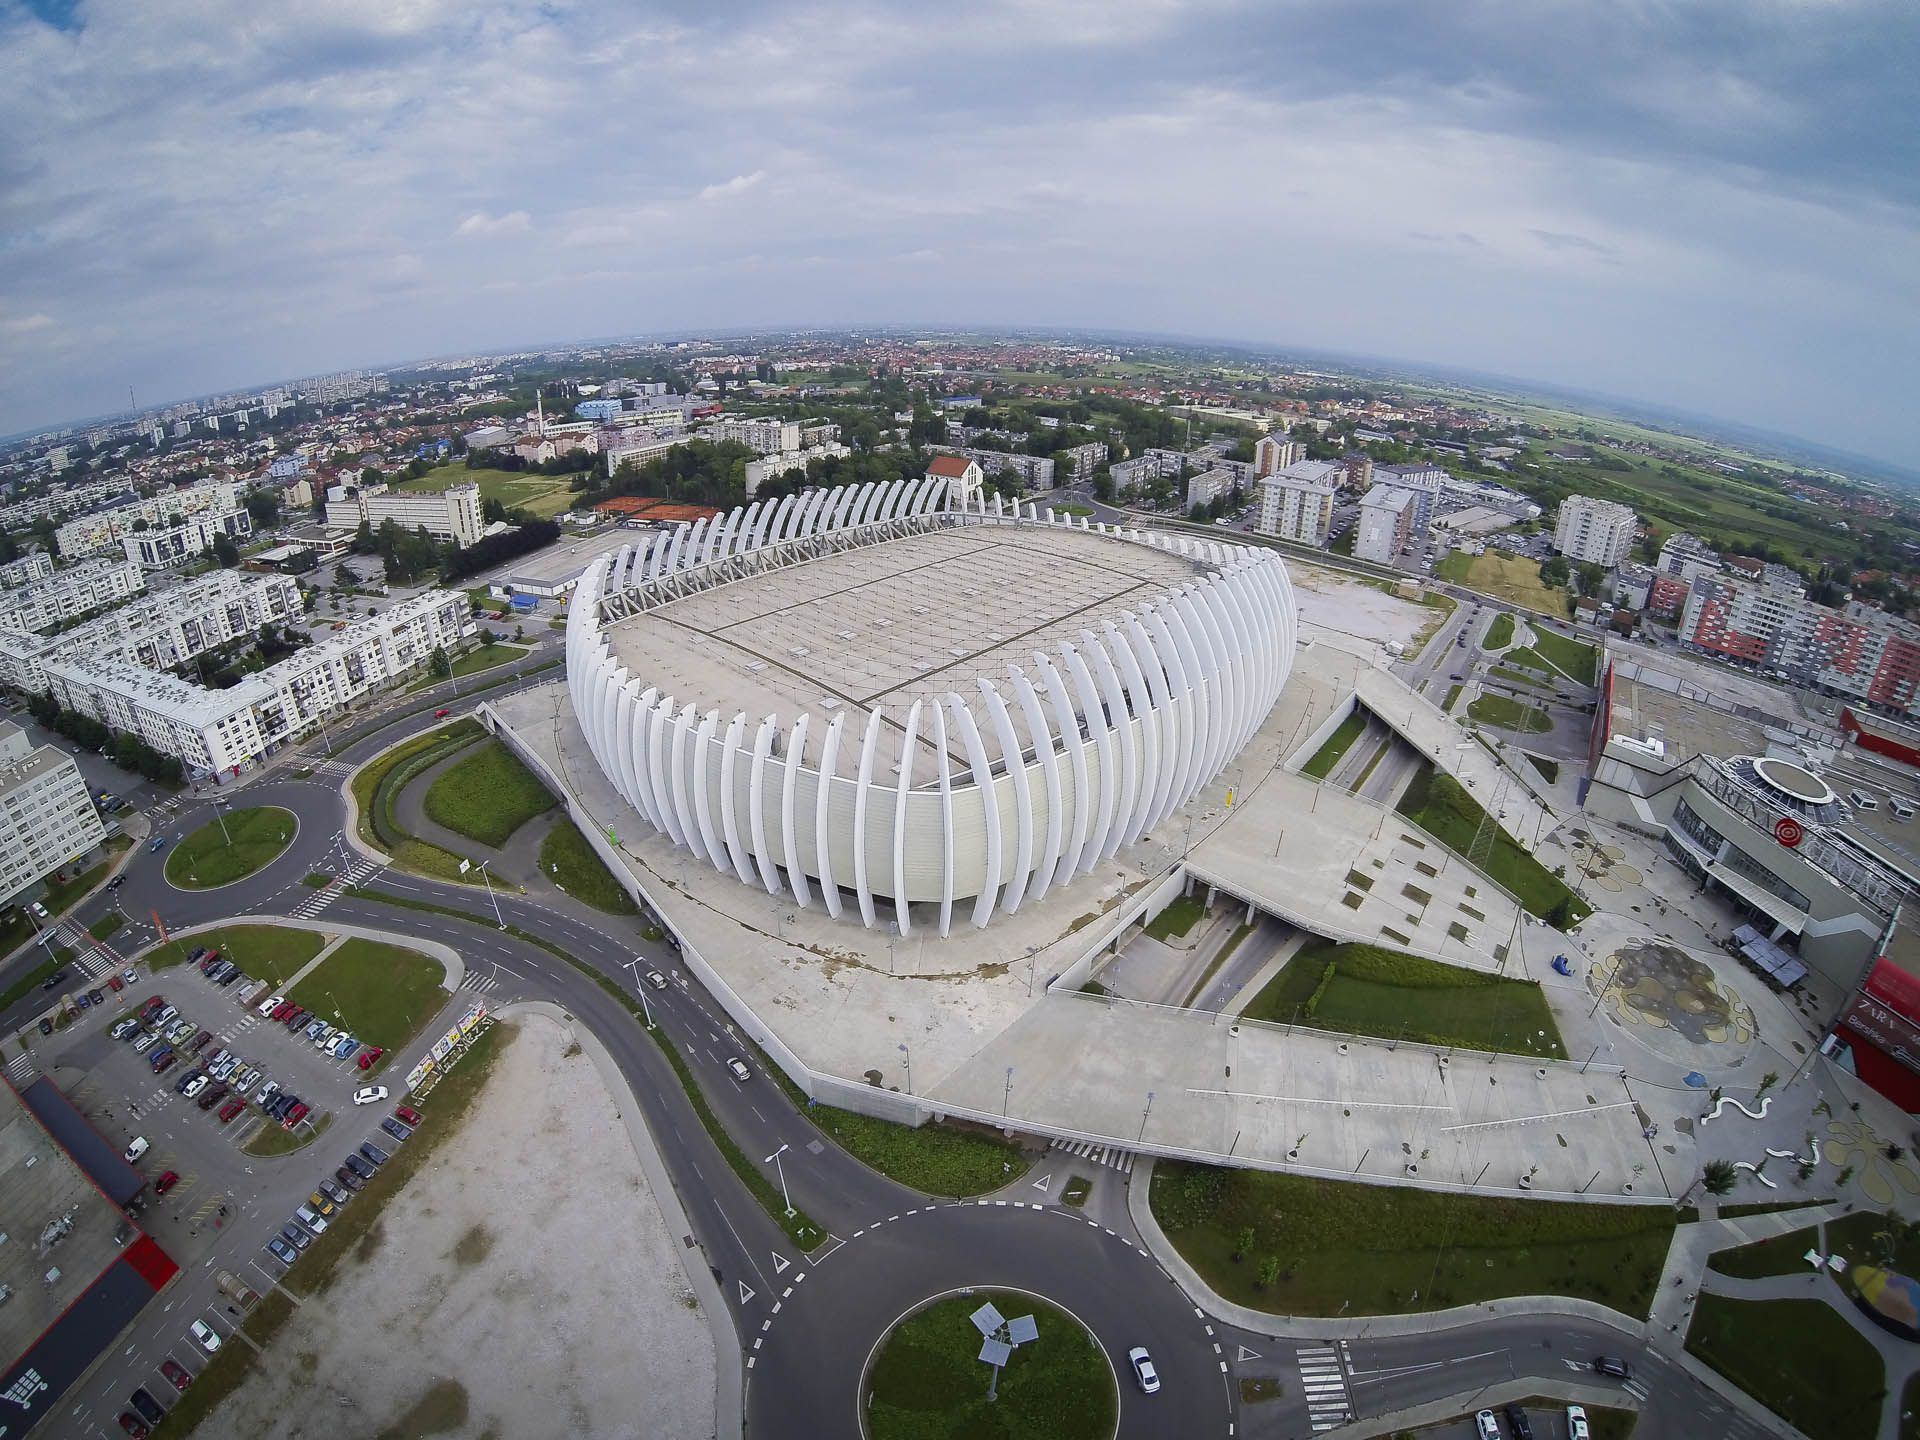 Arena Center Zagreb Zagreb Visit Croatia Capital Travel Love Lenuci Horseshoe Downtown Upper Town Oldtown Licitar Dolac Kaptol Banjelacic